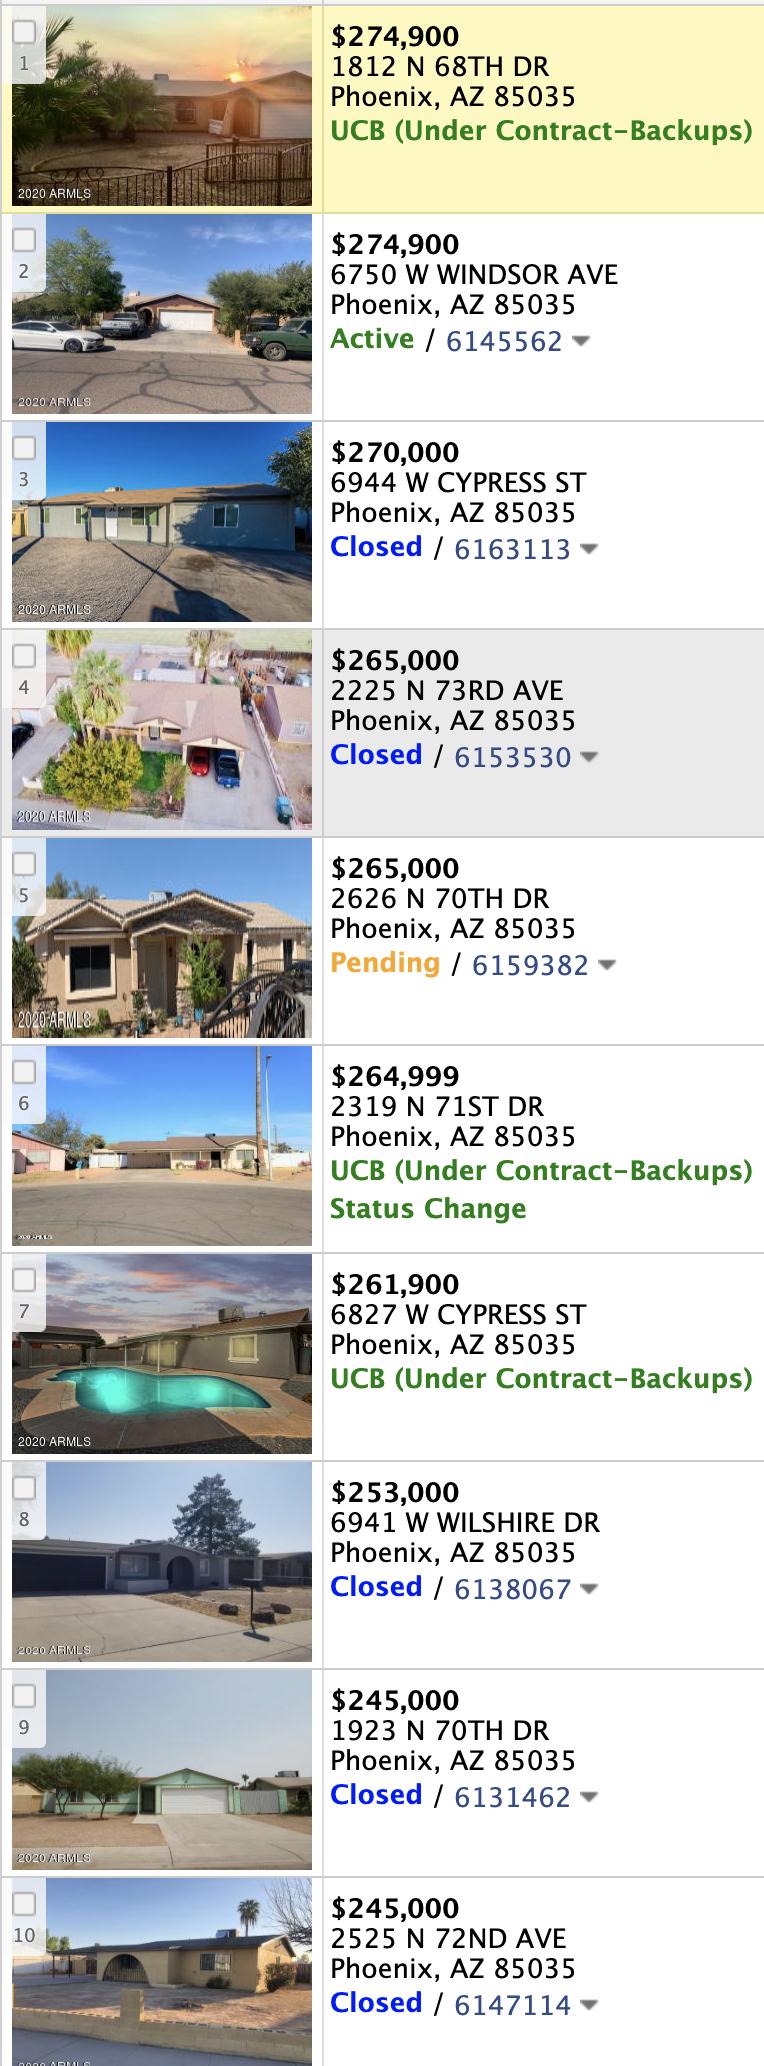 6801 W Cambridge Ave, Phoenix AZ 85035 comps list